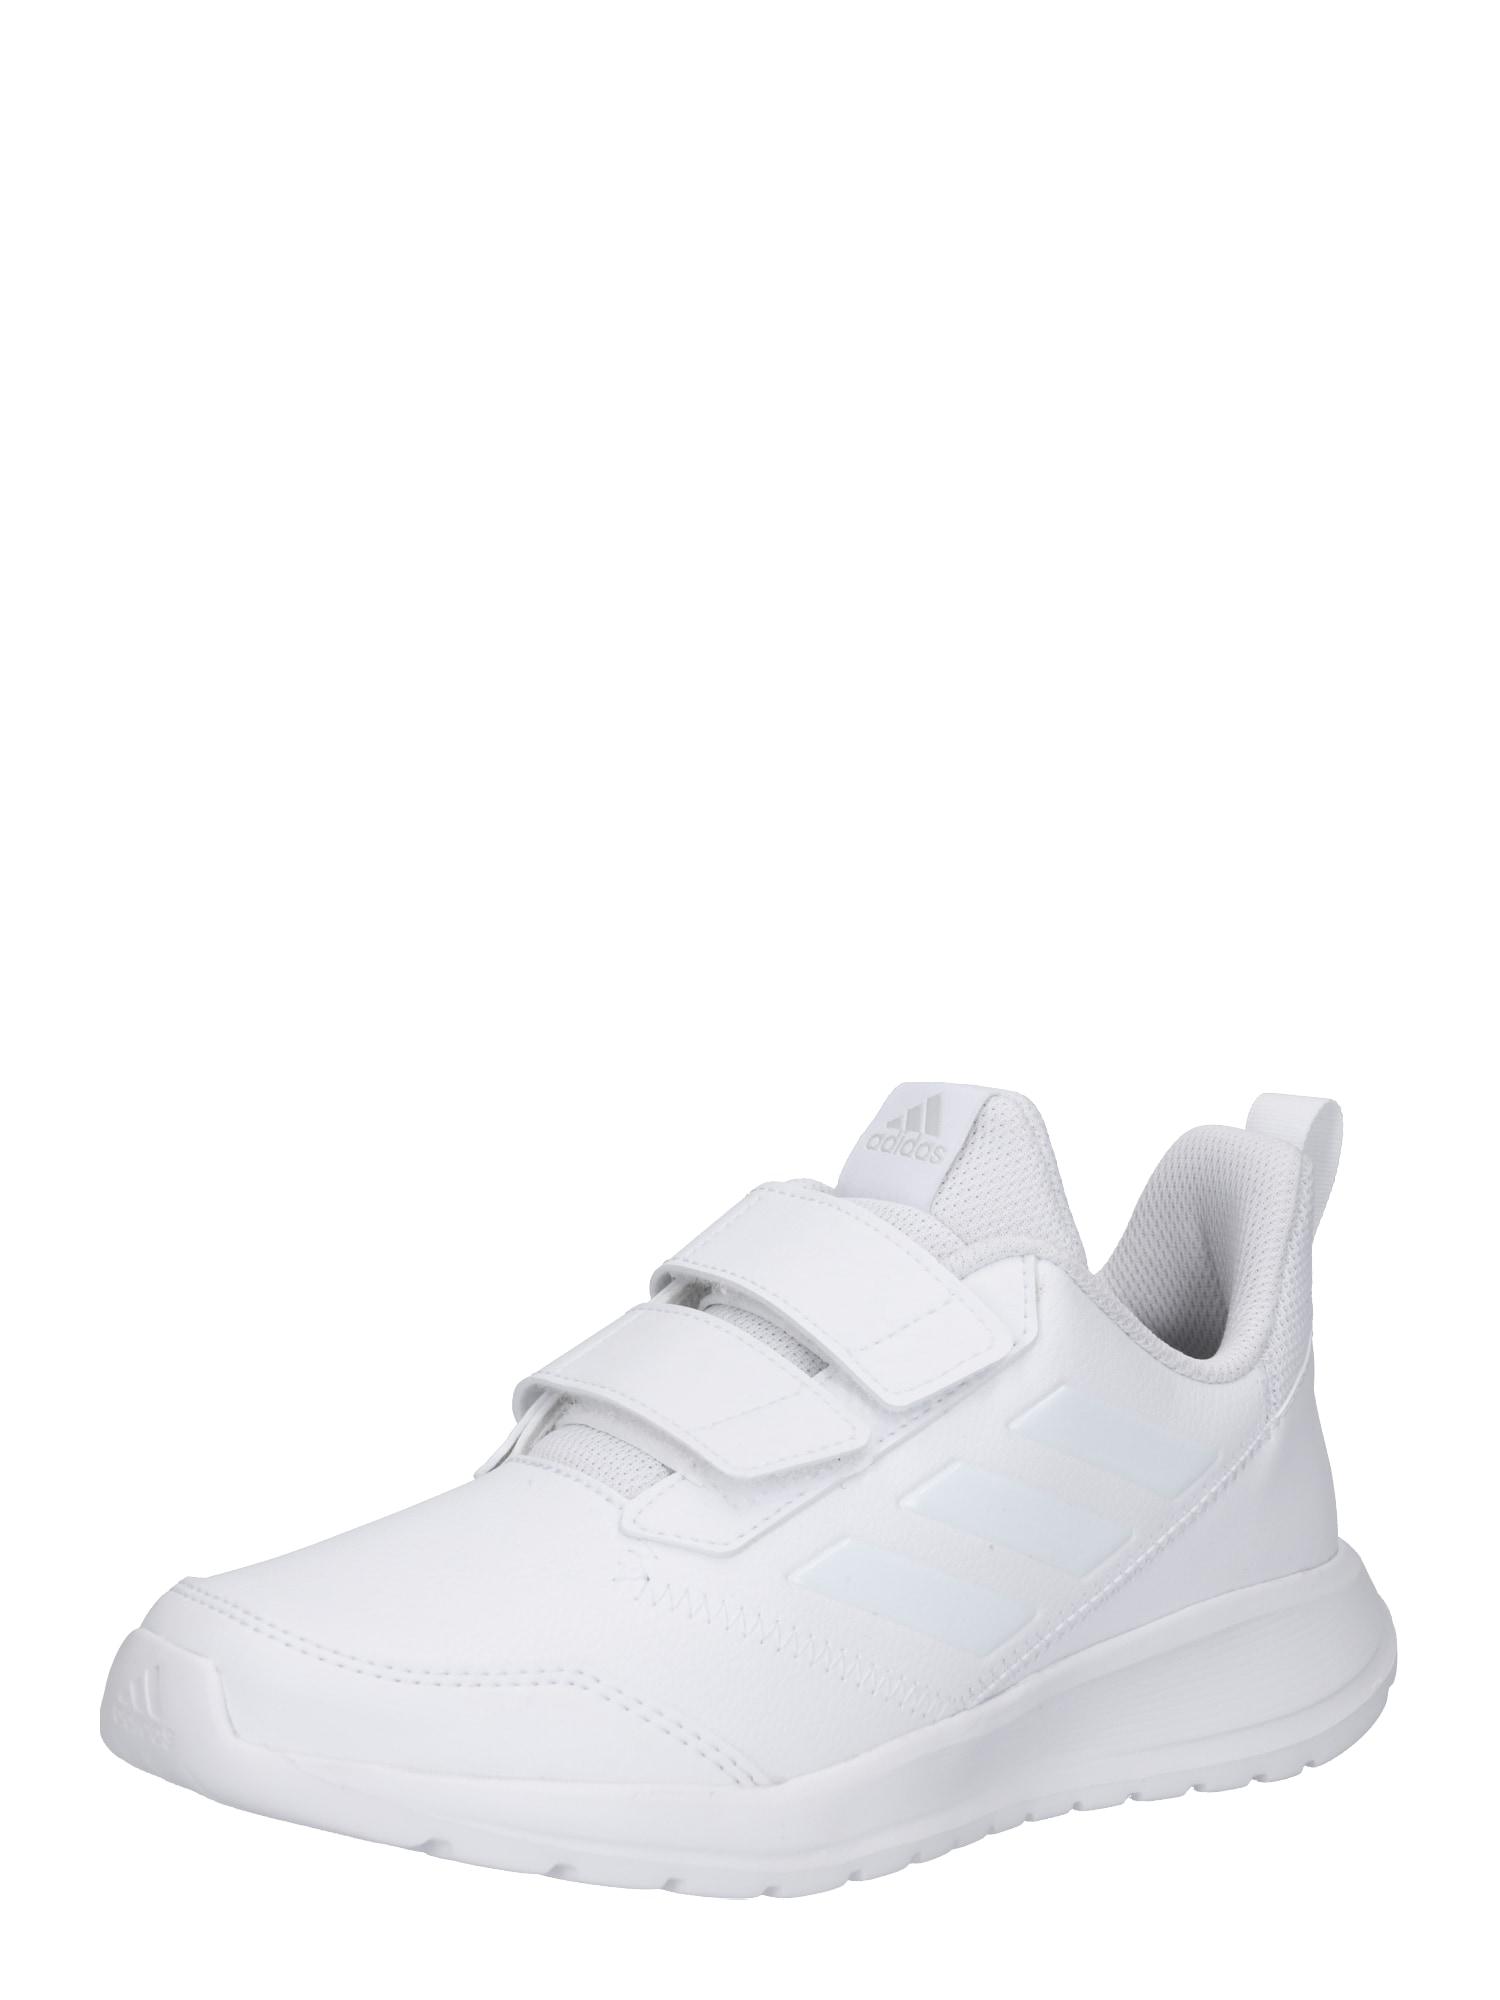 Sportovní boty AltaRun CF K bílá ADIDAS PERFORMANCE